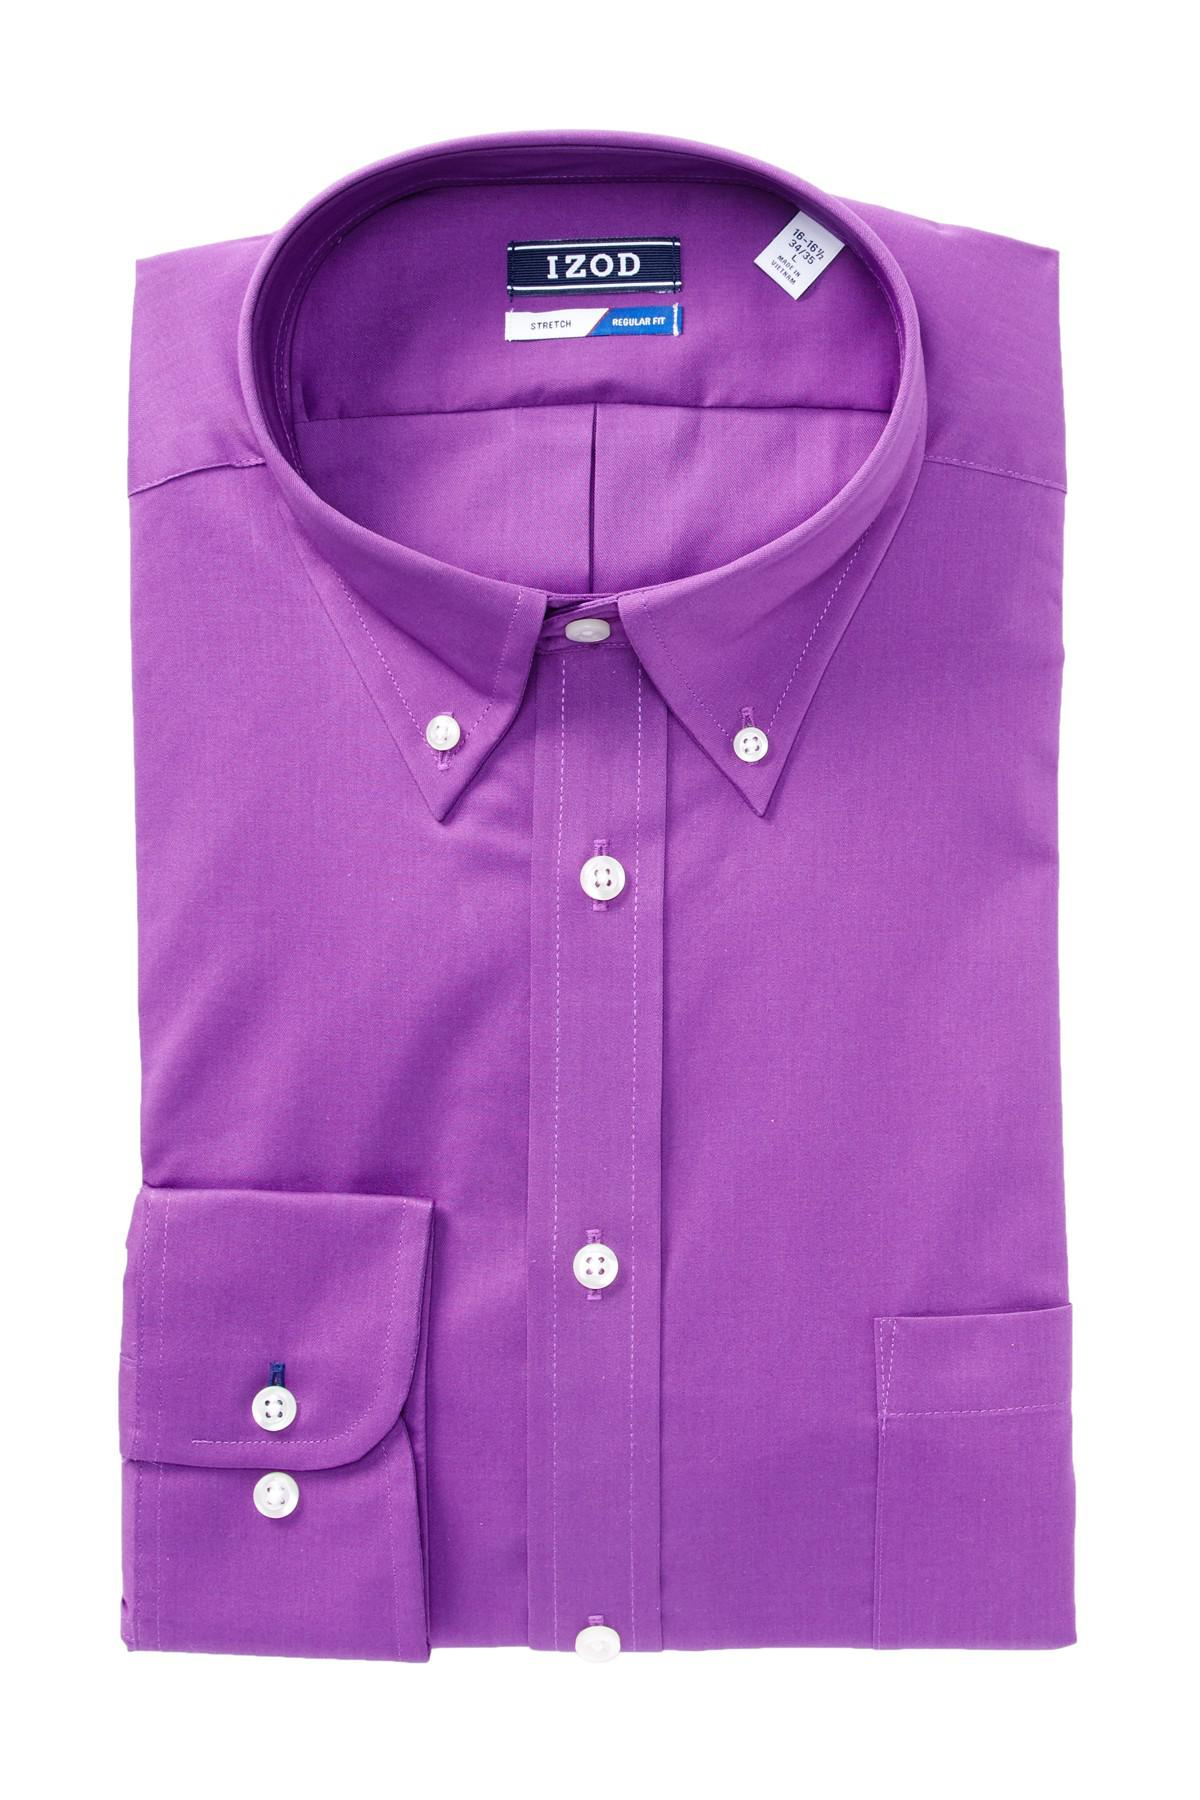 izod solid twill regular fit dress shirt in purple for men